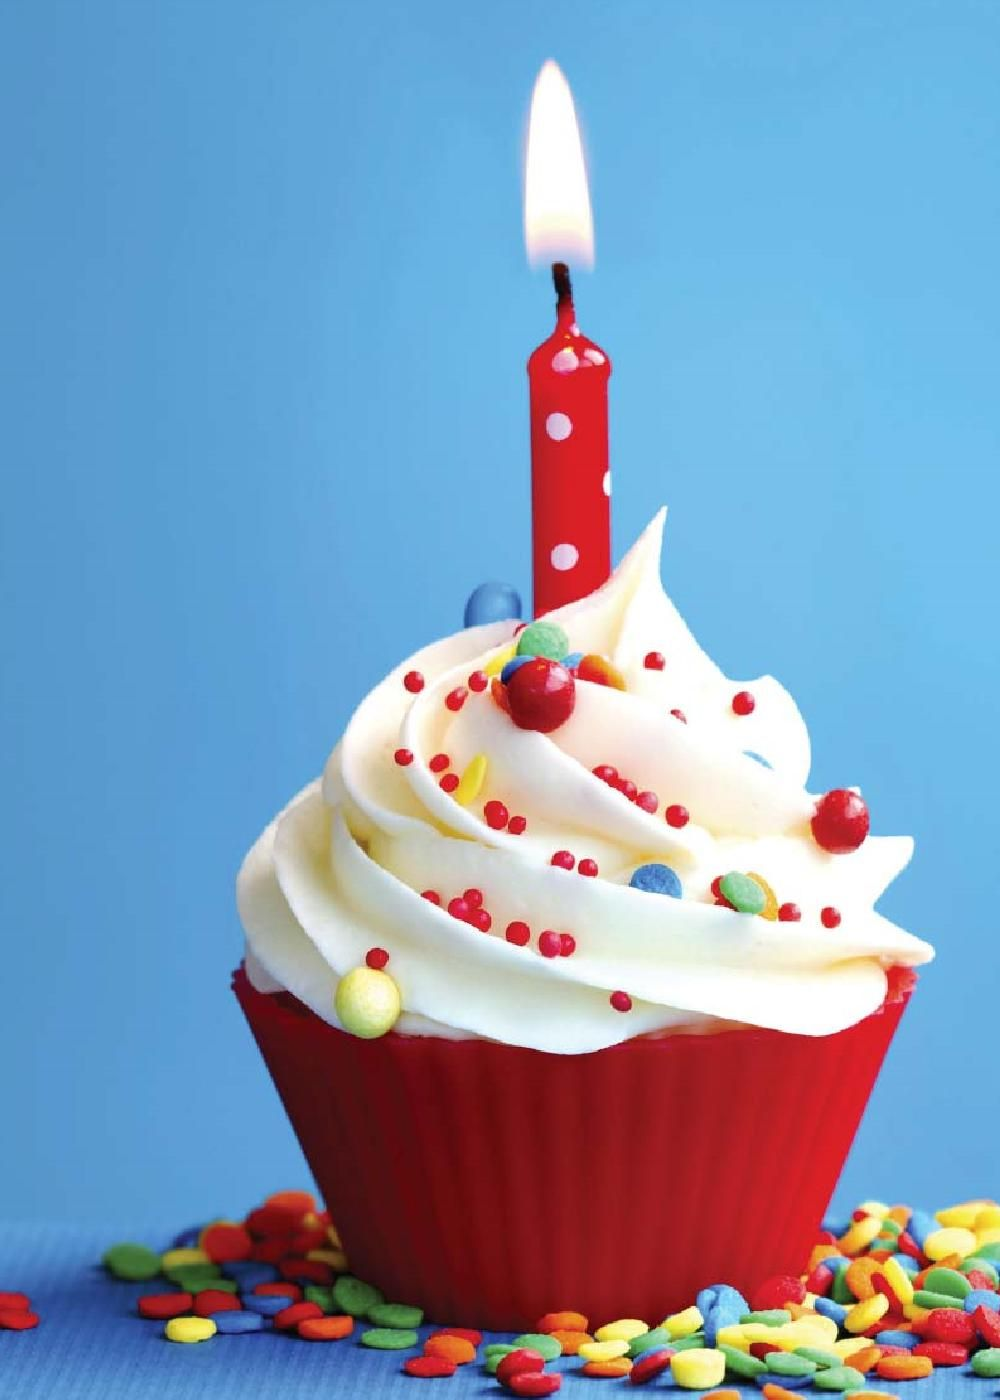 Happy Birthday Cathy : happy, birthday, cathy, Happy, Birthday, Cathy